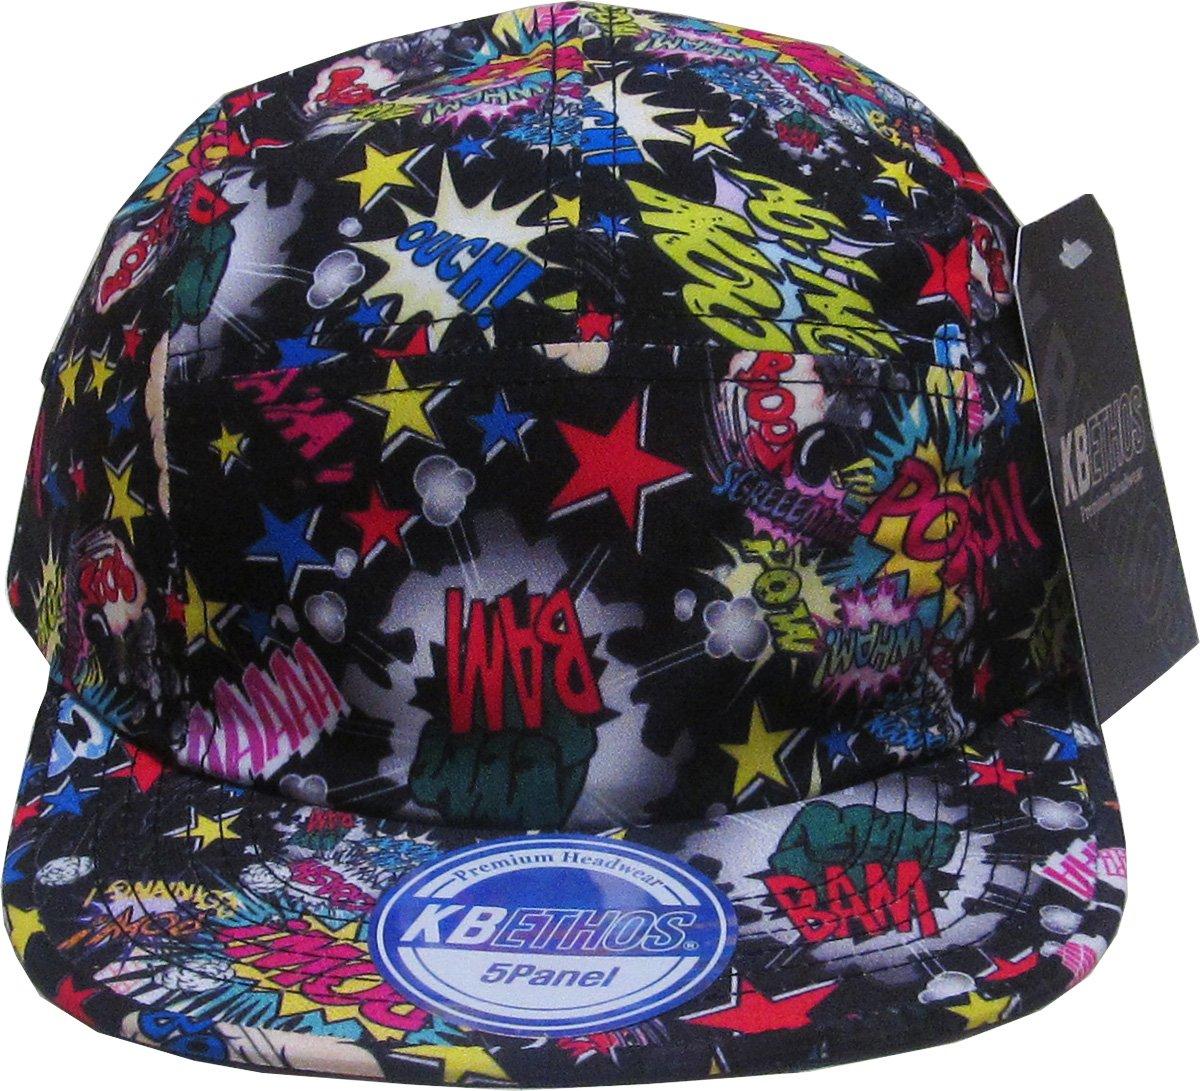 a395686ff79 Amazon.com  KB5-009 BLK Print 5 Panel Army Cap Adjustable Hat  Sports    Outdoors